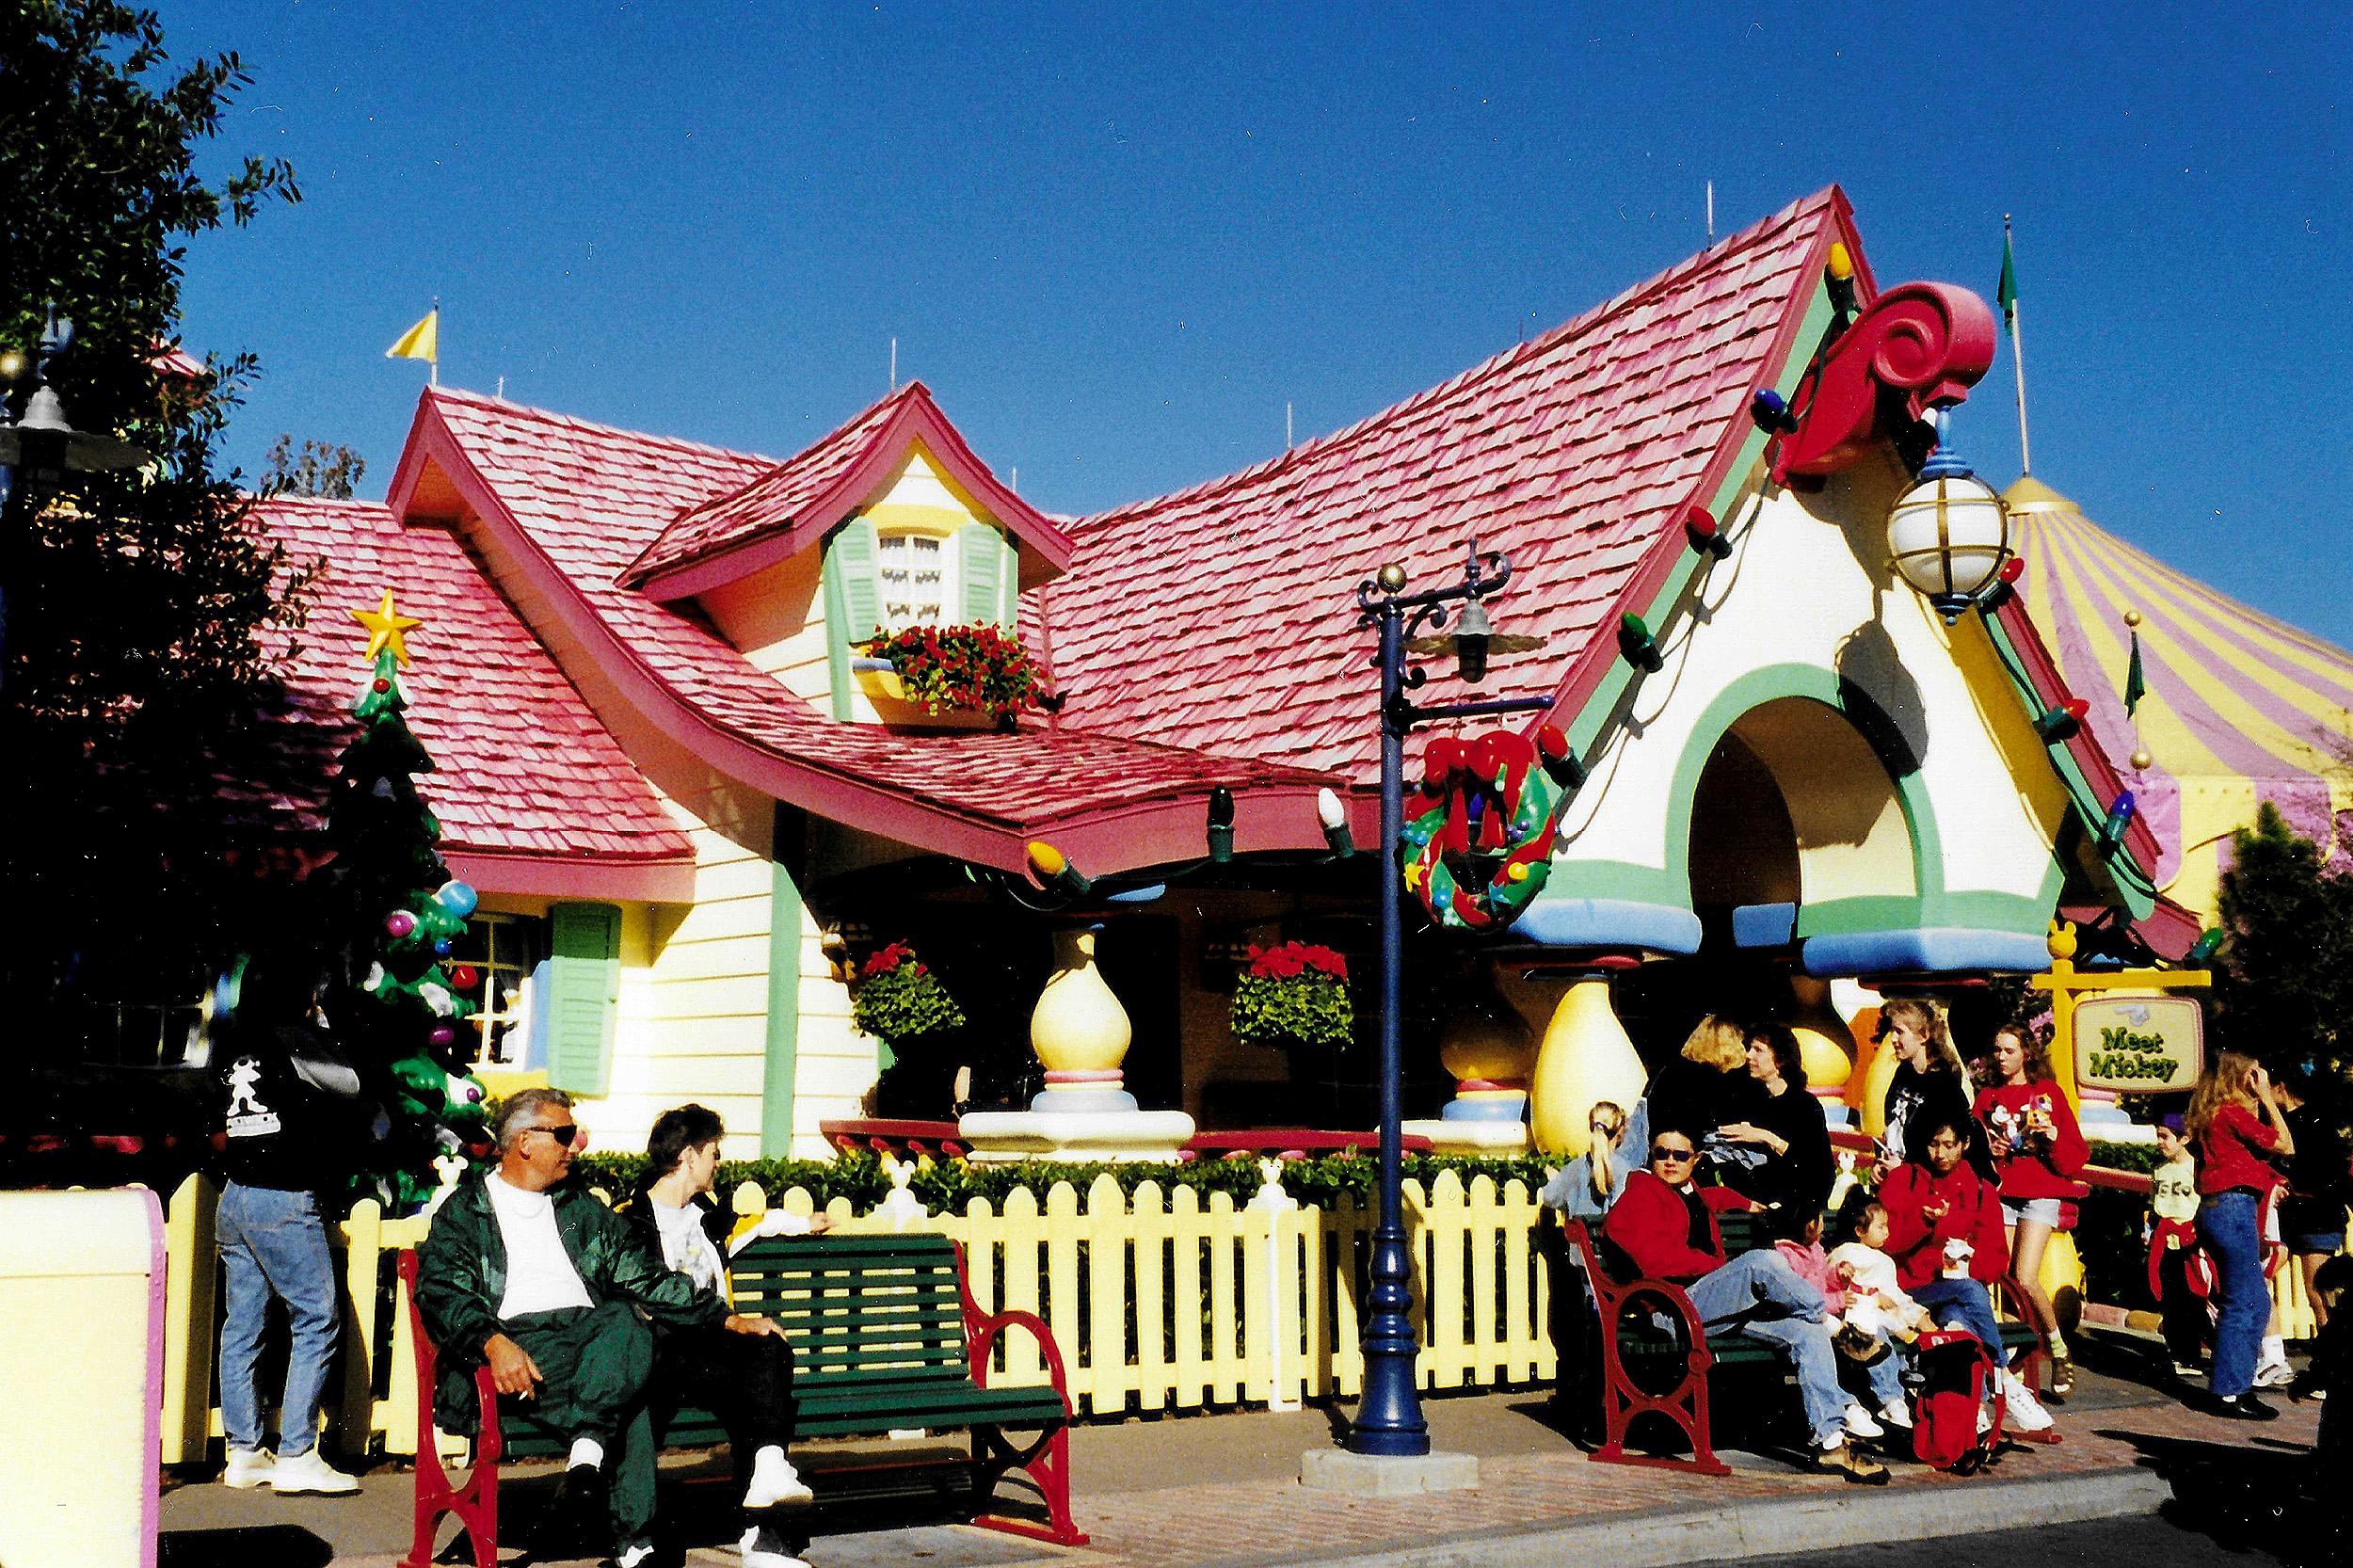 Musses Hus magic Kingdom Orlando Florida Nyårsafton